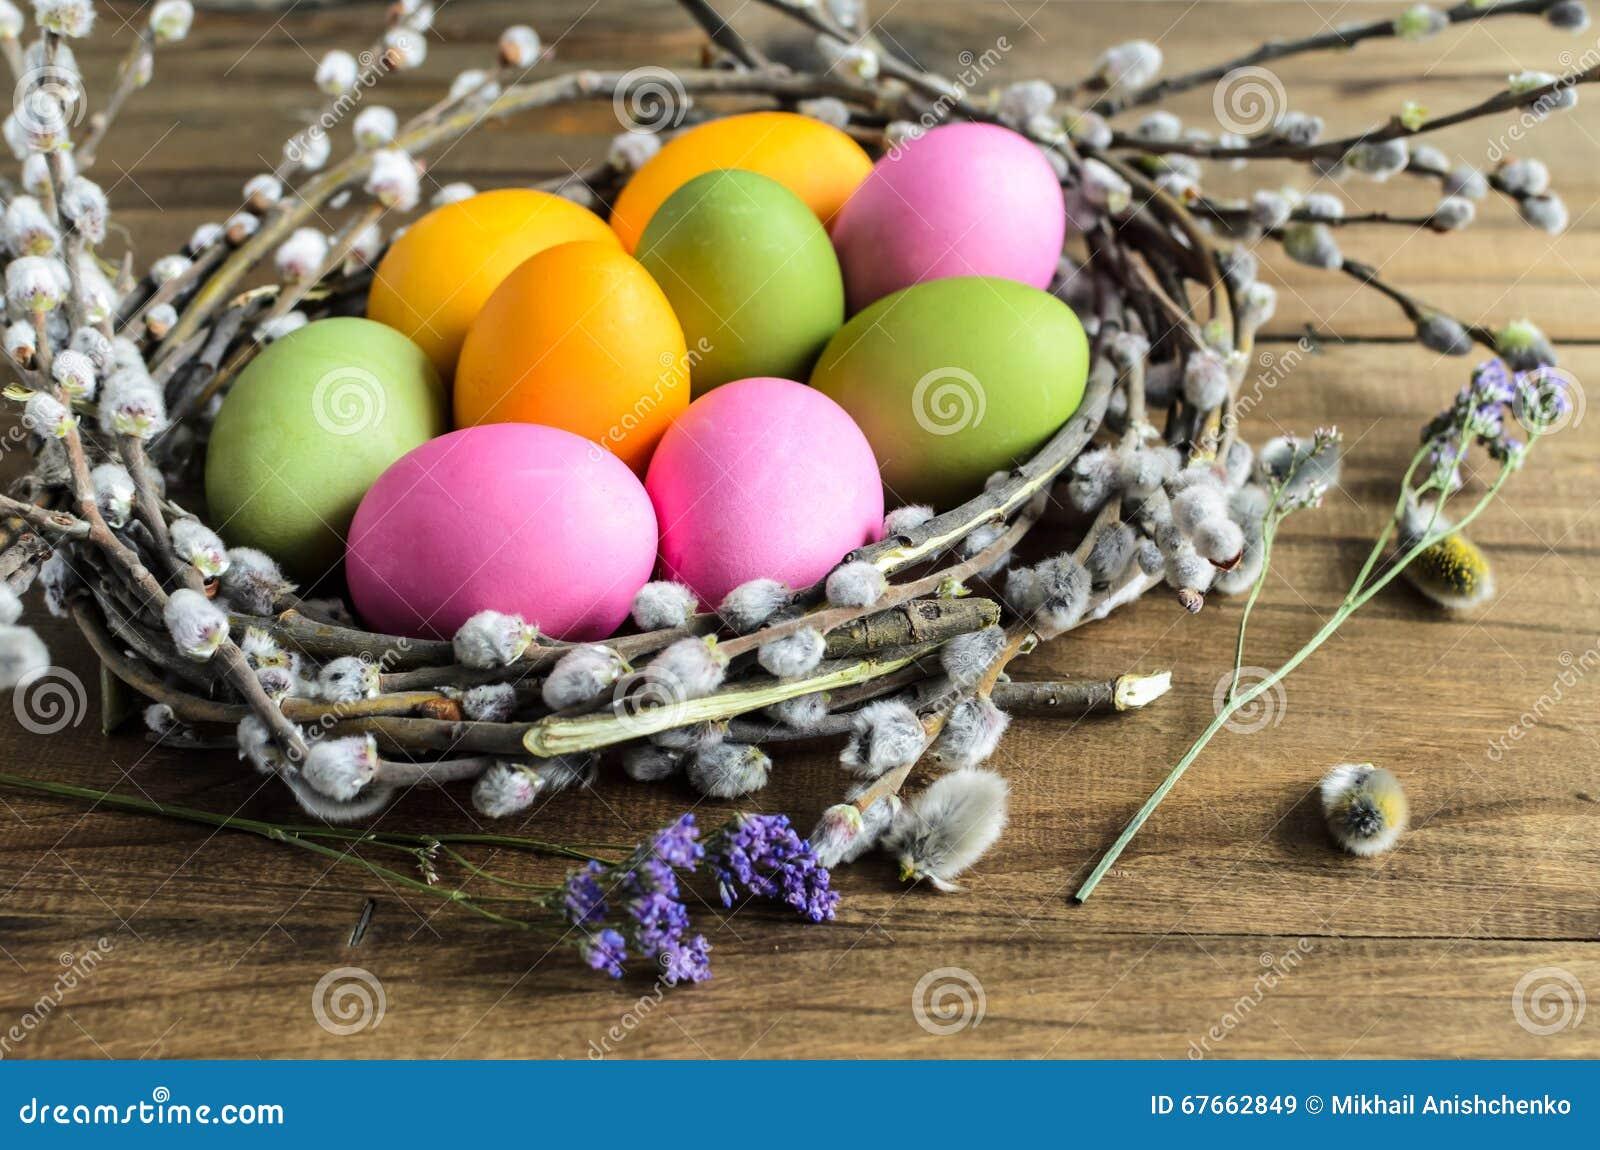 Home Make Eggs Food For Bird